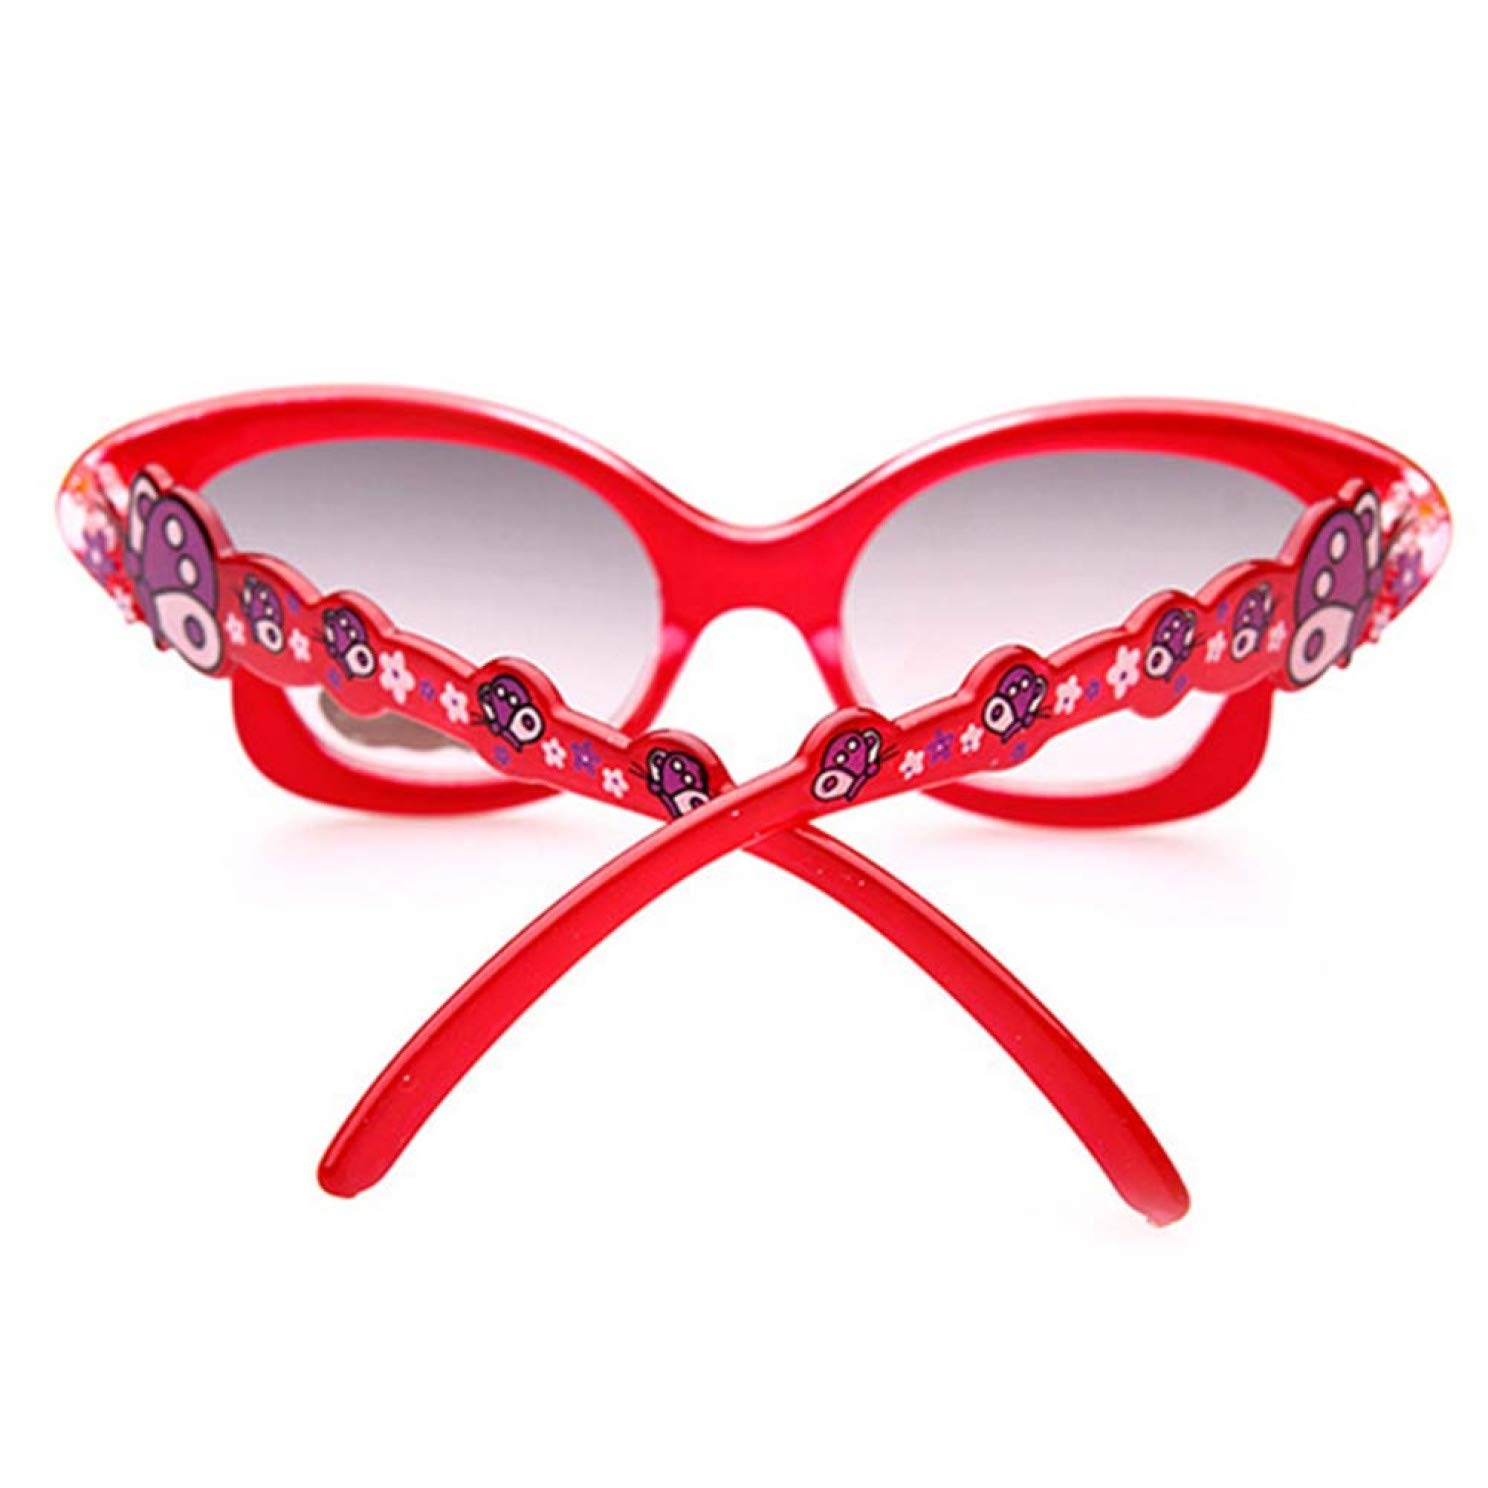 shihudgd Baby Jungen Sonnenbrille rot rot 0-24 Monate